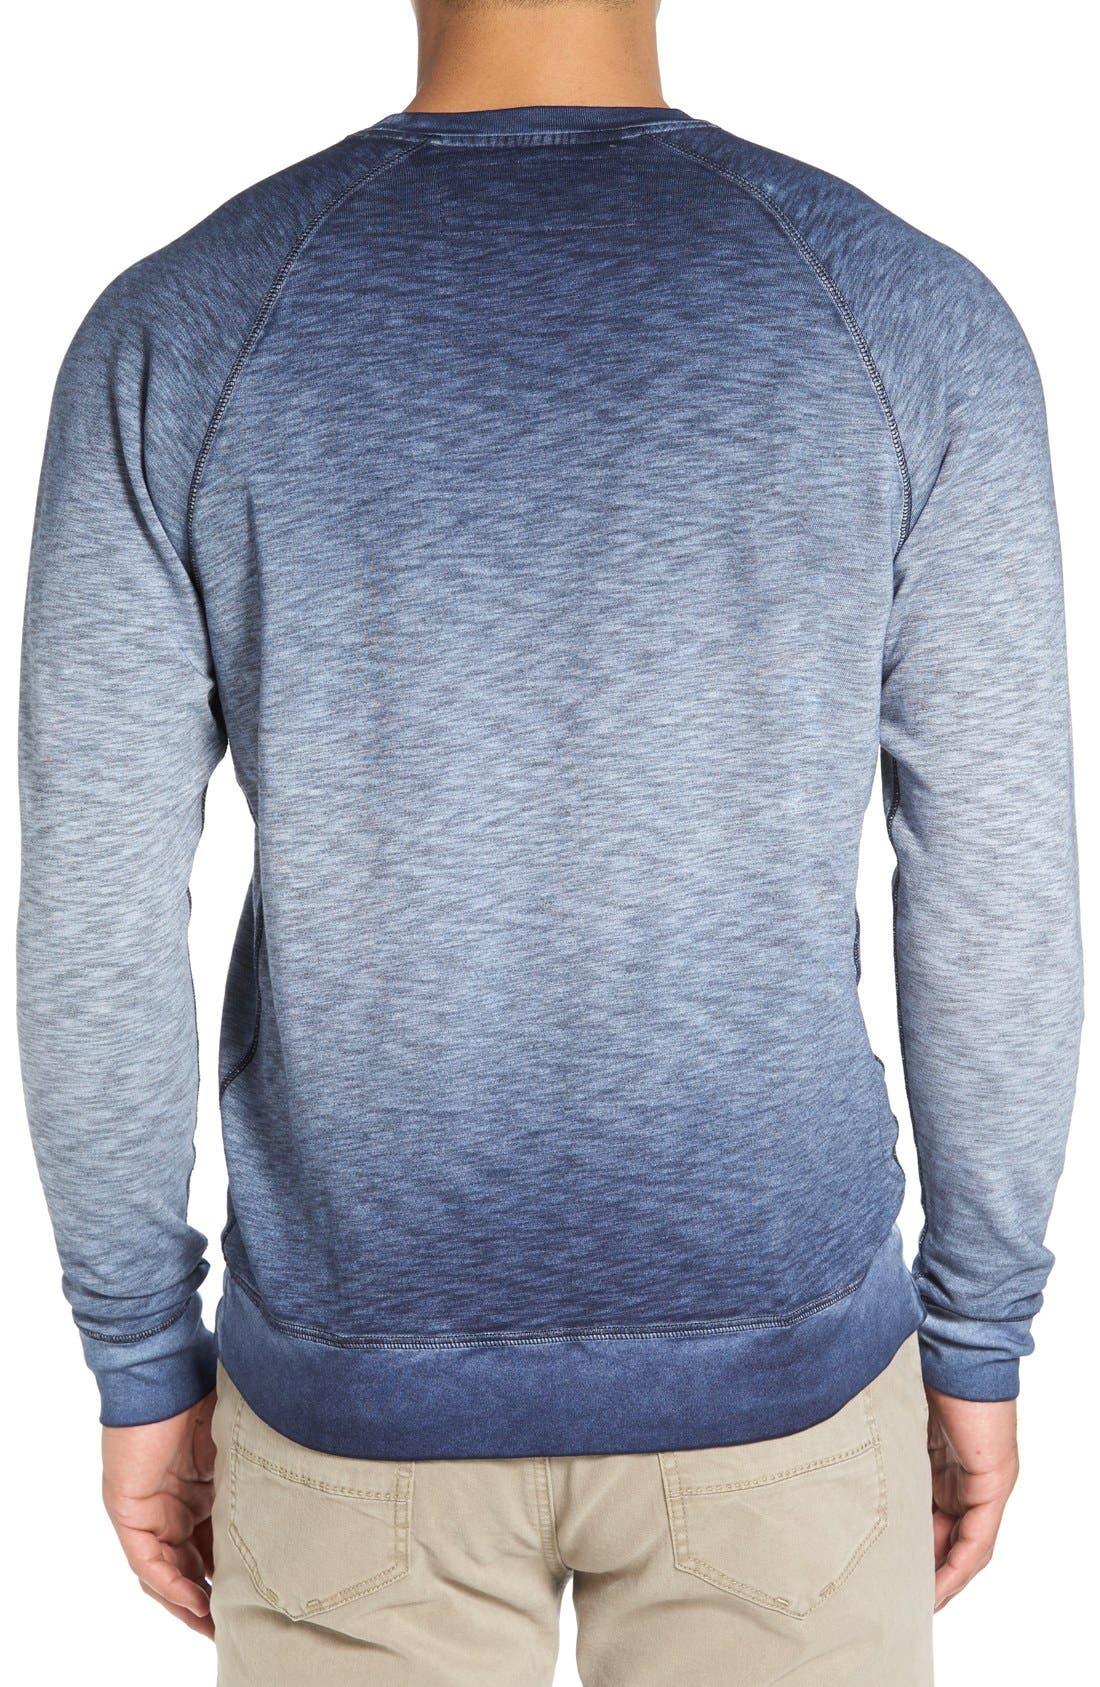 'Santiago' Ombré Crewneck Sweatshirt,                             Alternate thumbnail 2, color,                             Navy